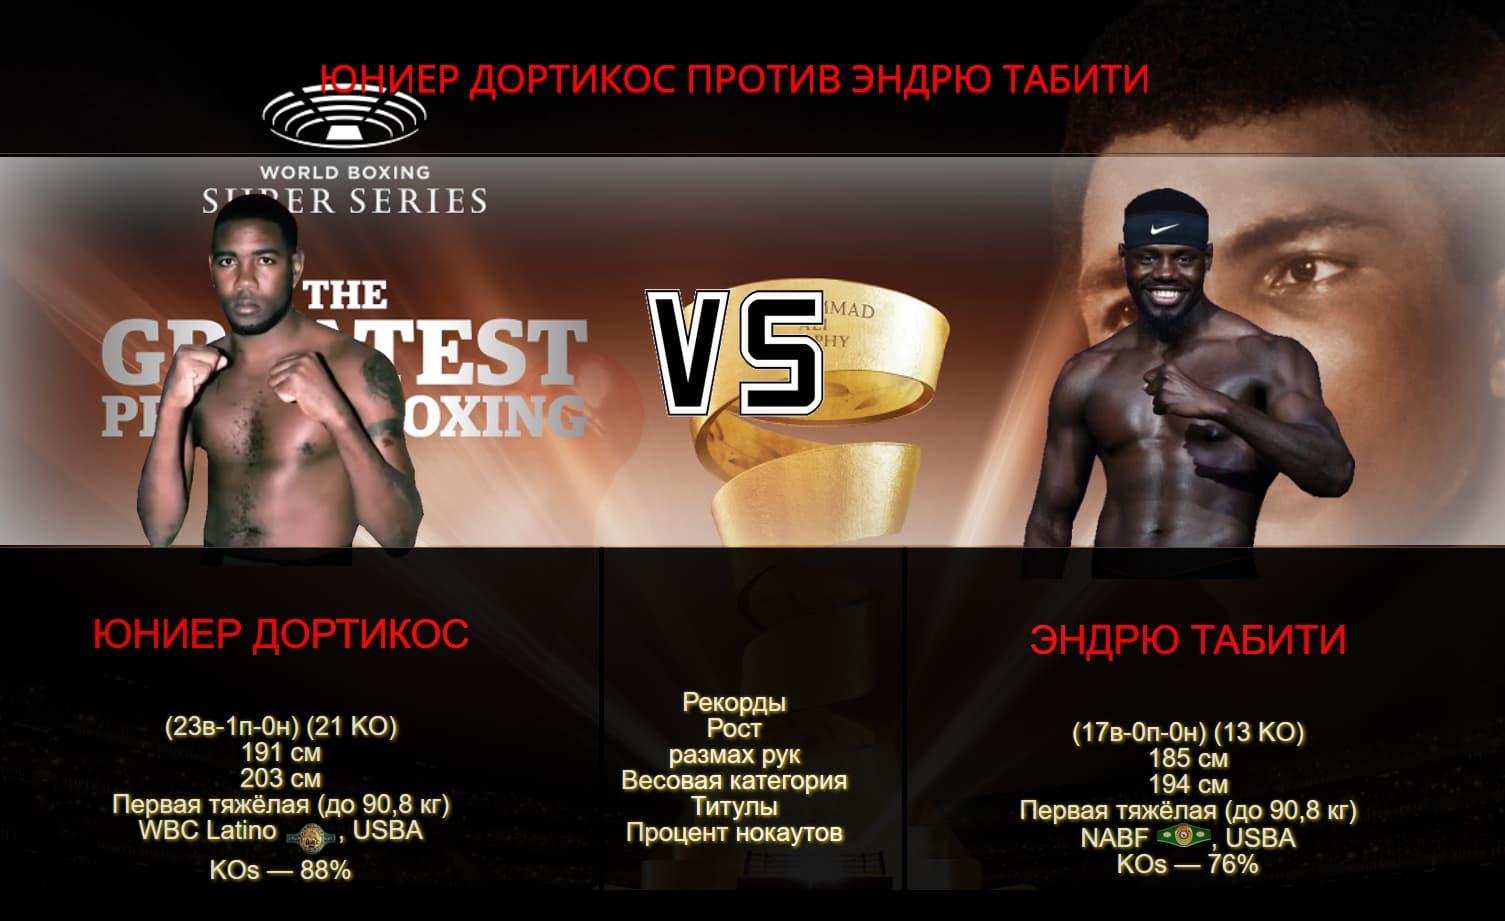 Афиша - бой Сергей Липинец против Ламонт Питерсон -Sergey Lipinets vs Lamont Peterson